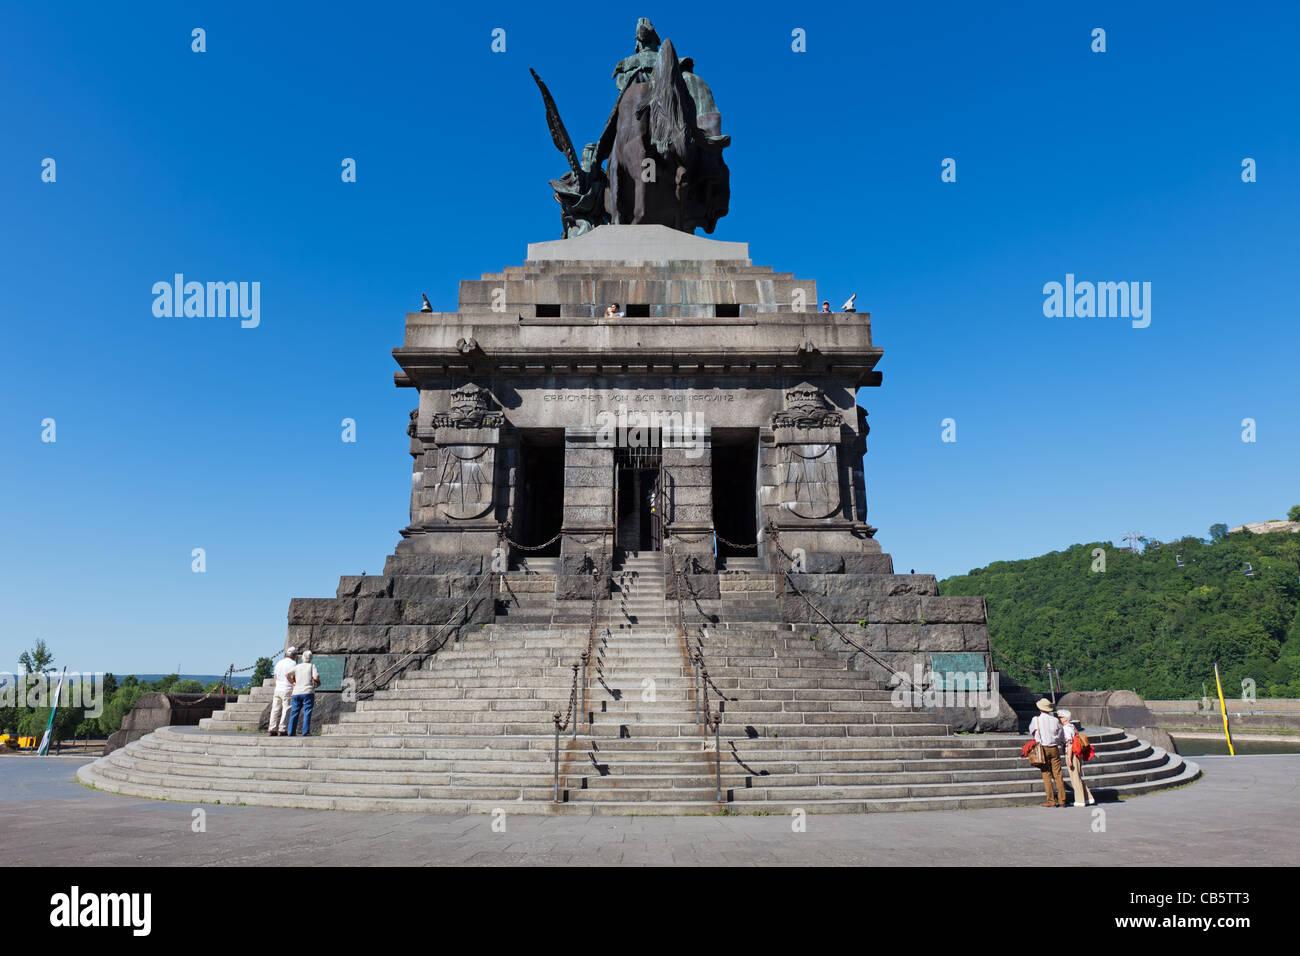 The Deutsches Eck (German Corner), a famous landmark in the German city of Koblenz - Stock Image